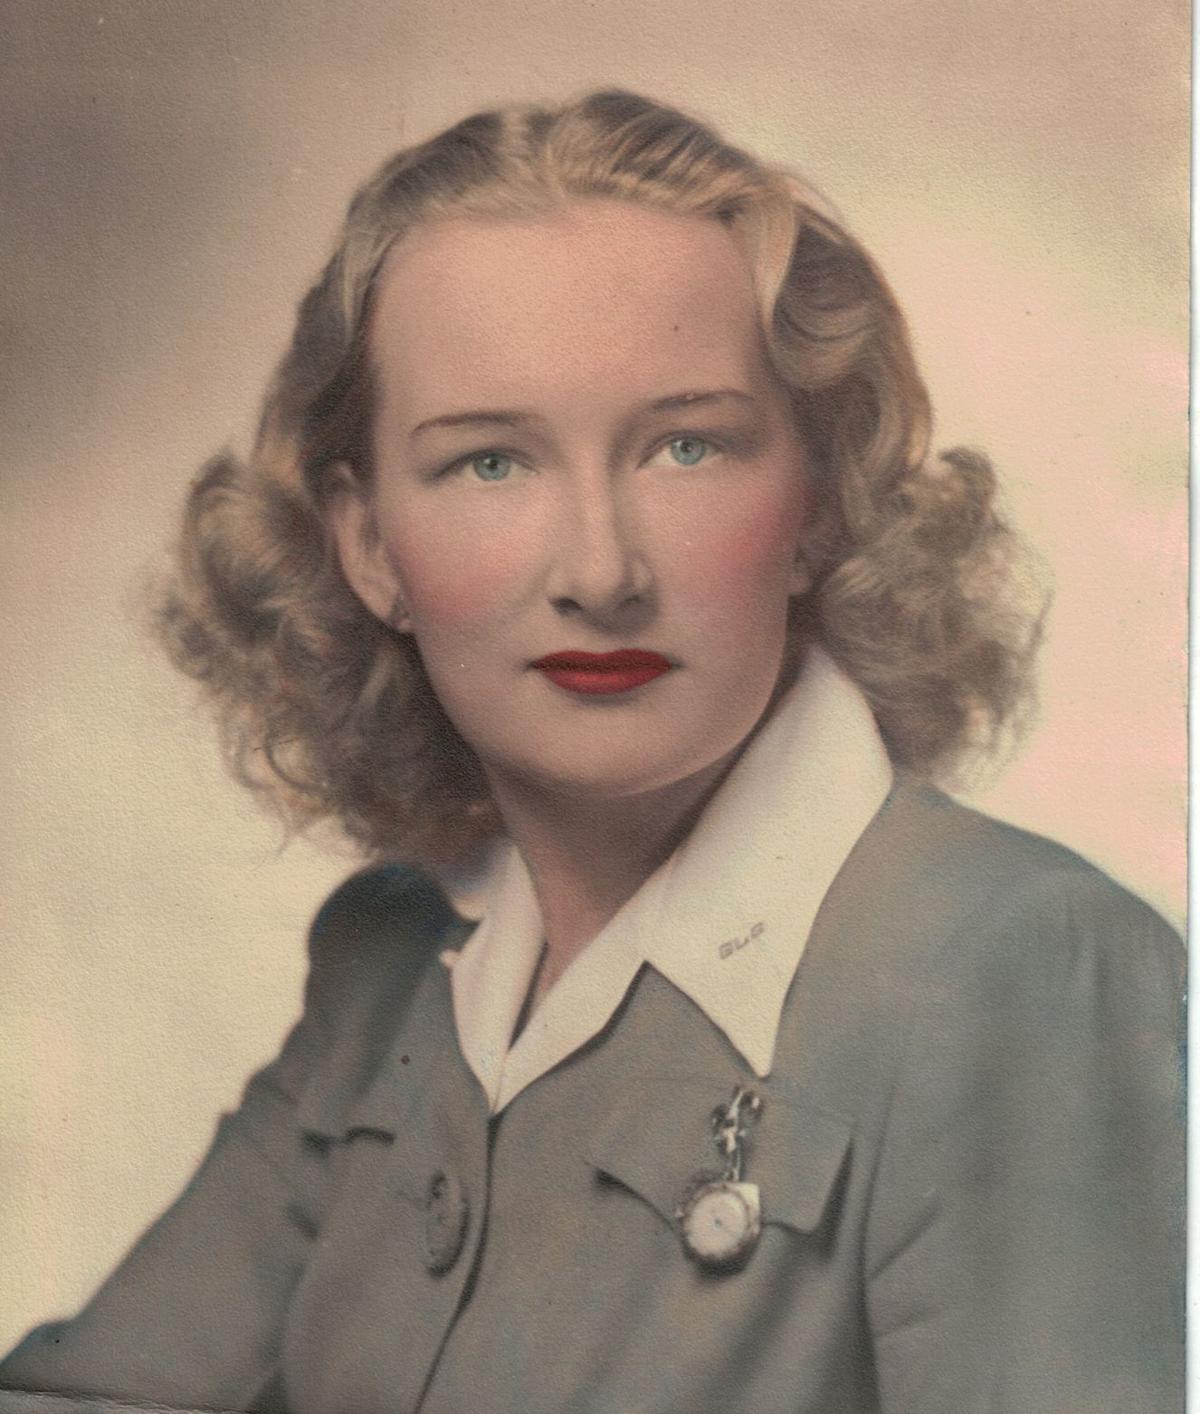 Greta Ericson during WWII